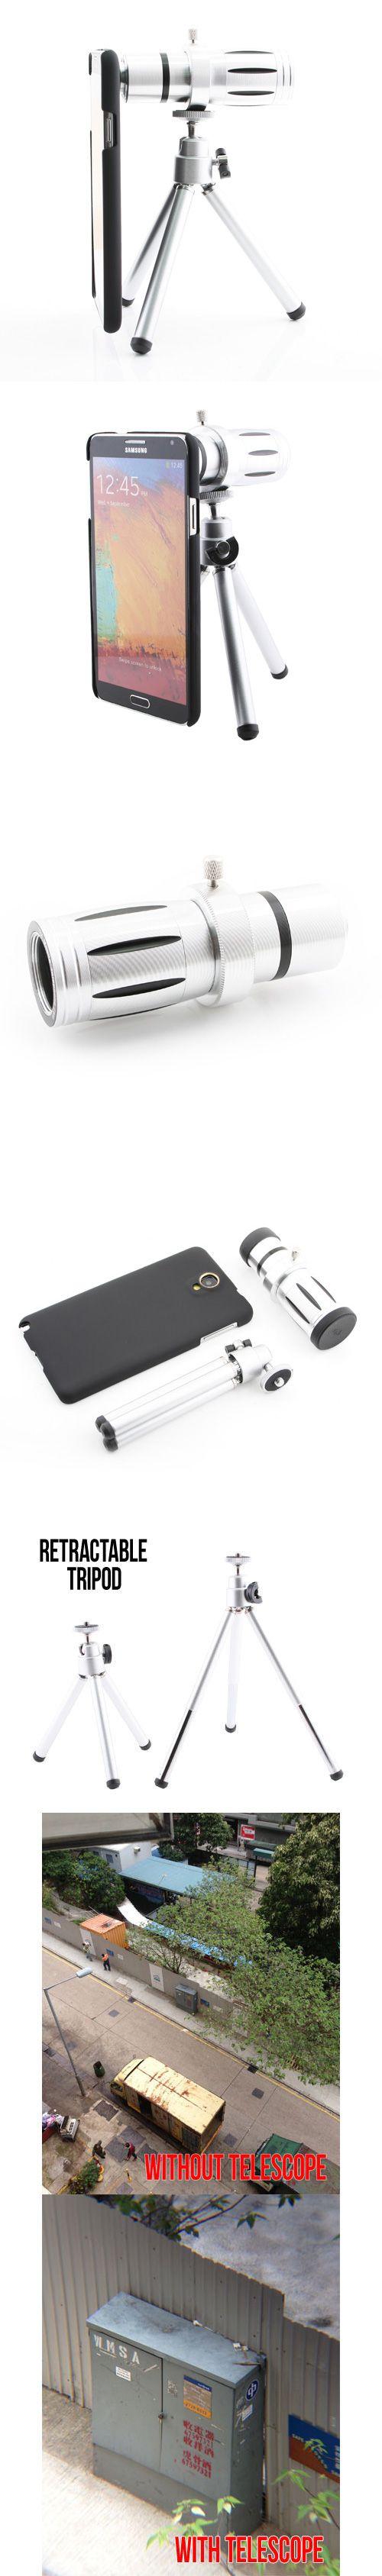 Samsung Galaxy Note 3 Ultra Zoom Telescope http://www.usbgeek.com/products/galaxy-note3-ultra-zoom-telescope